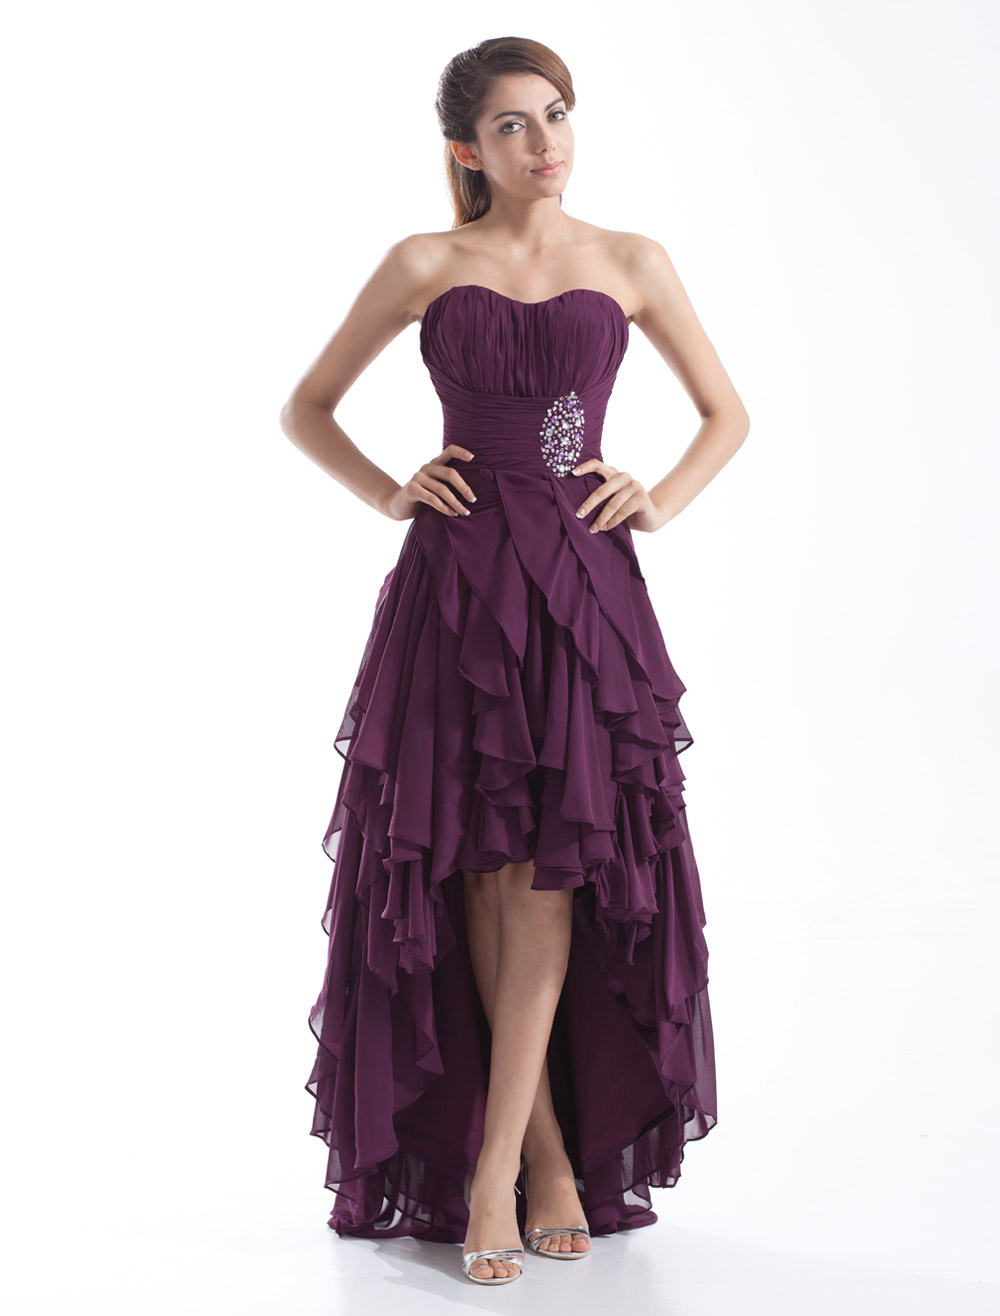 Grape Prom Dress High-Low Strapless Backless Beaded Chiffon Dress